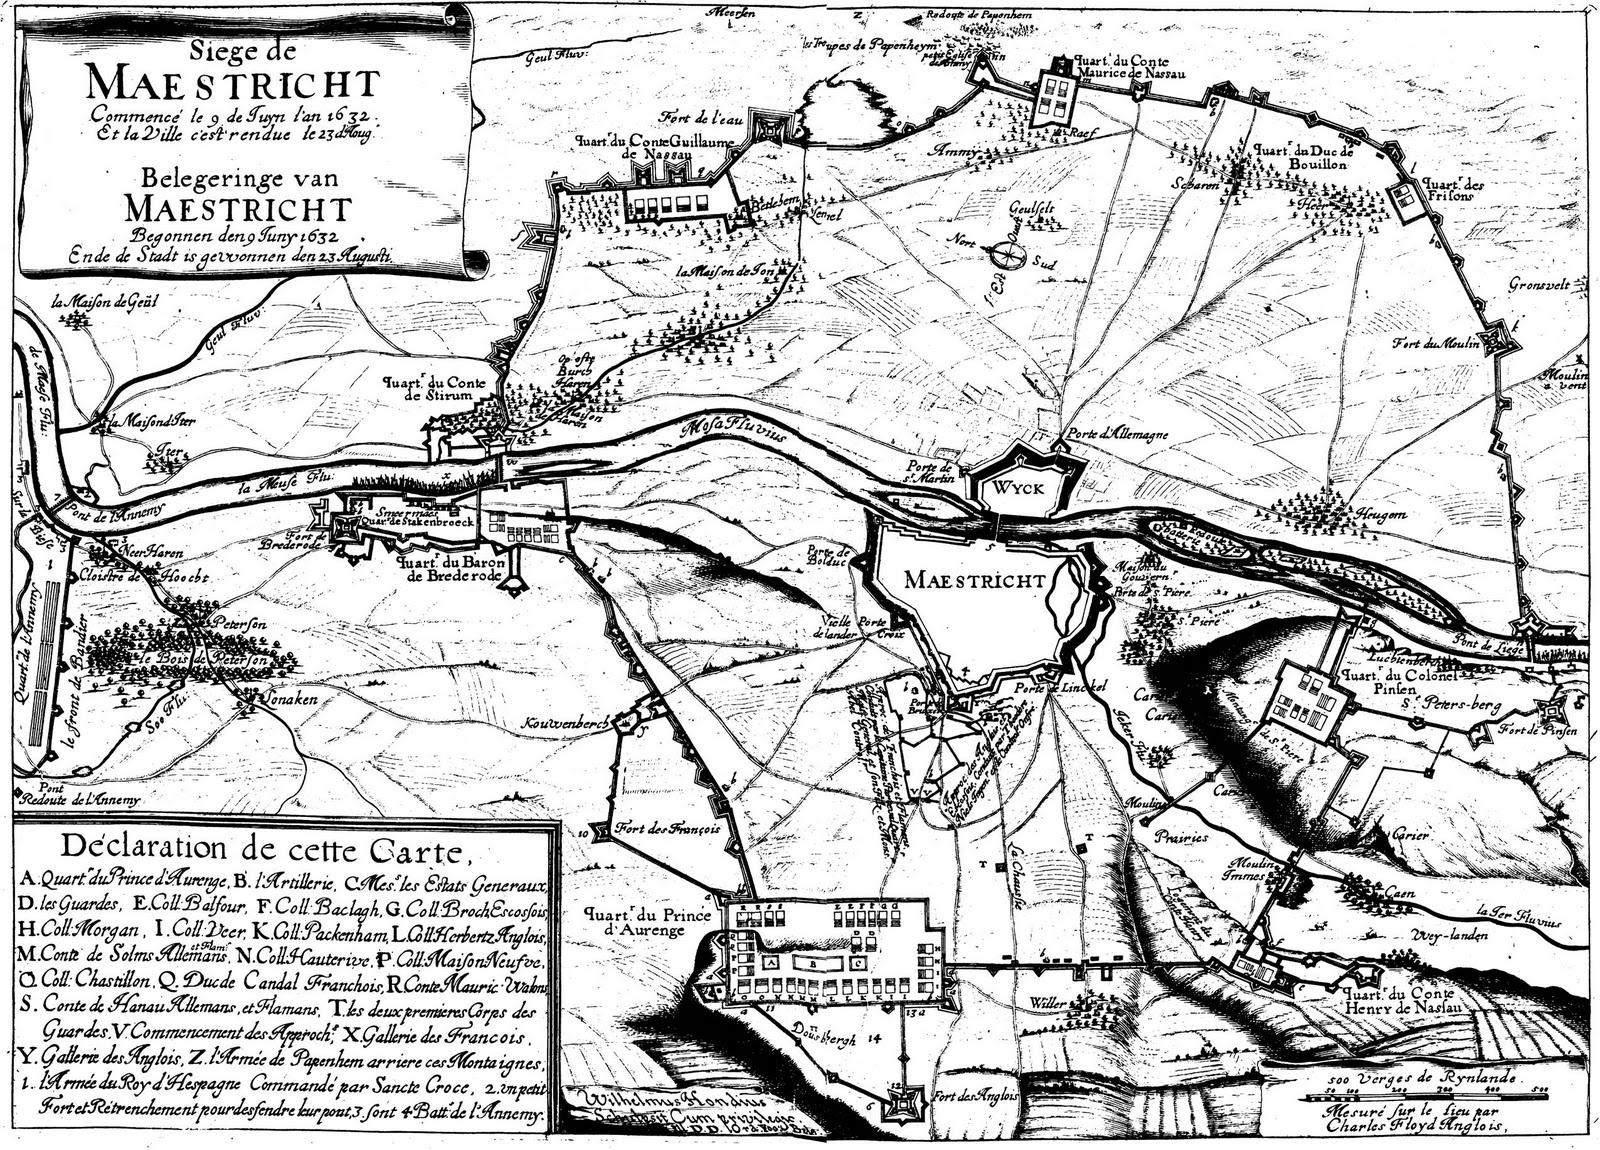 Siege of Maestricht by Dutch army in 1632